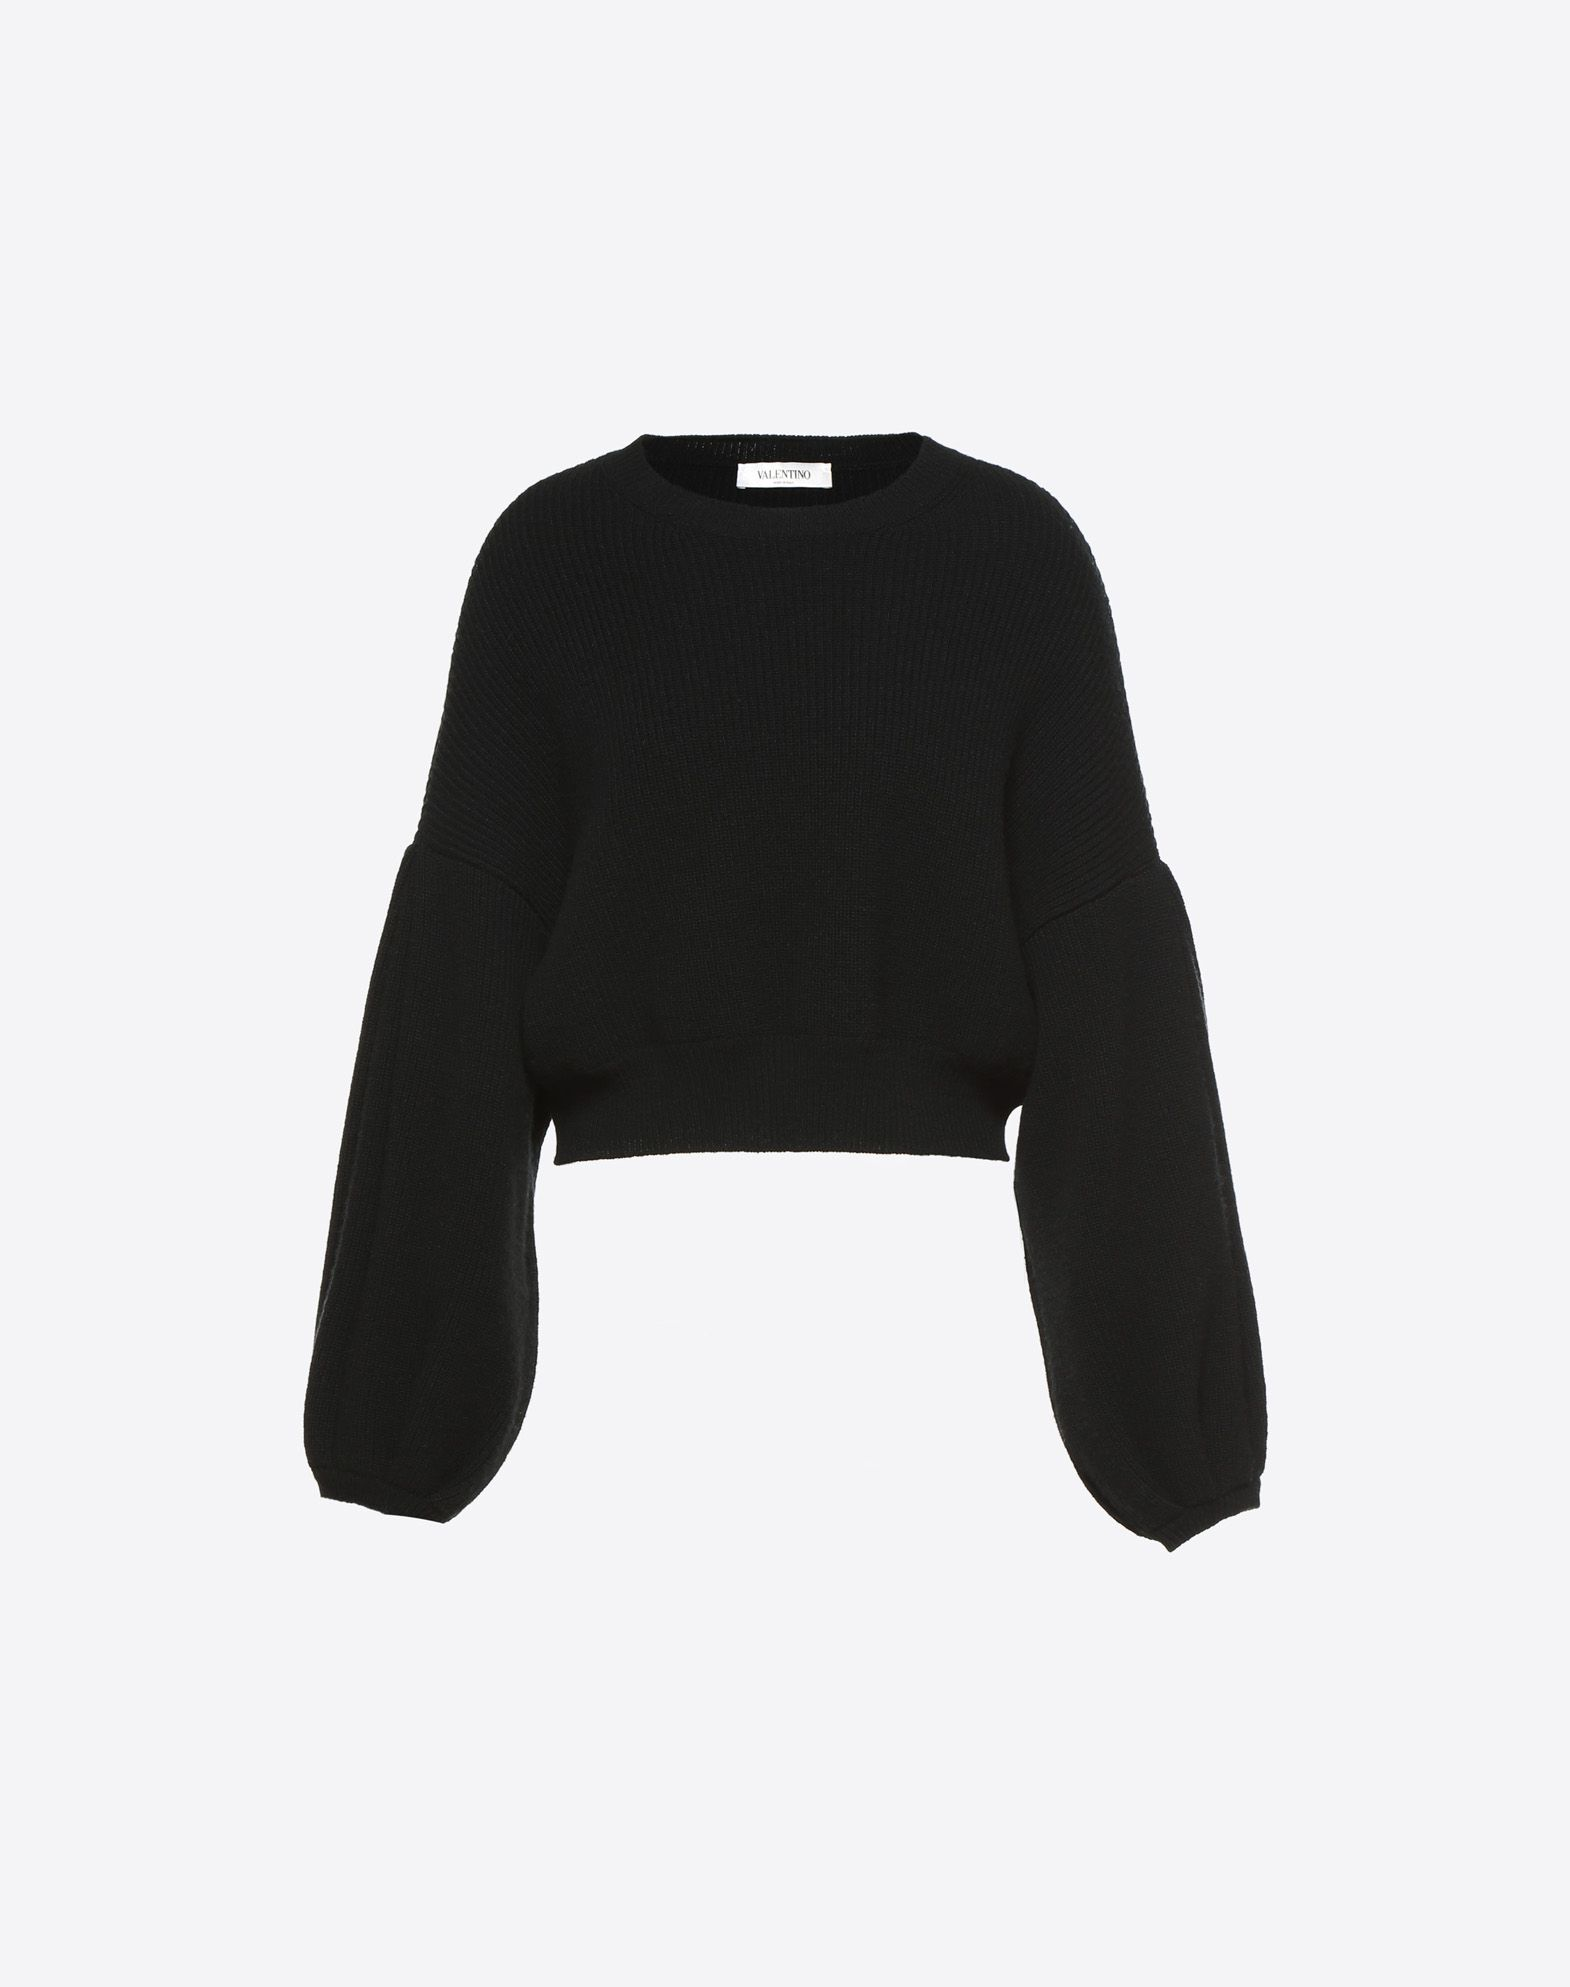 Jumper in Cashmere Wool